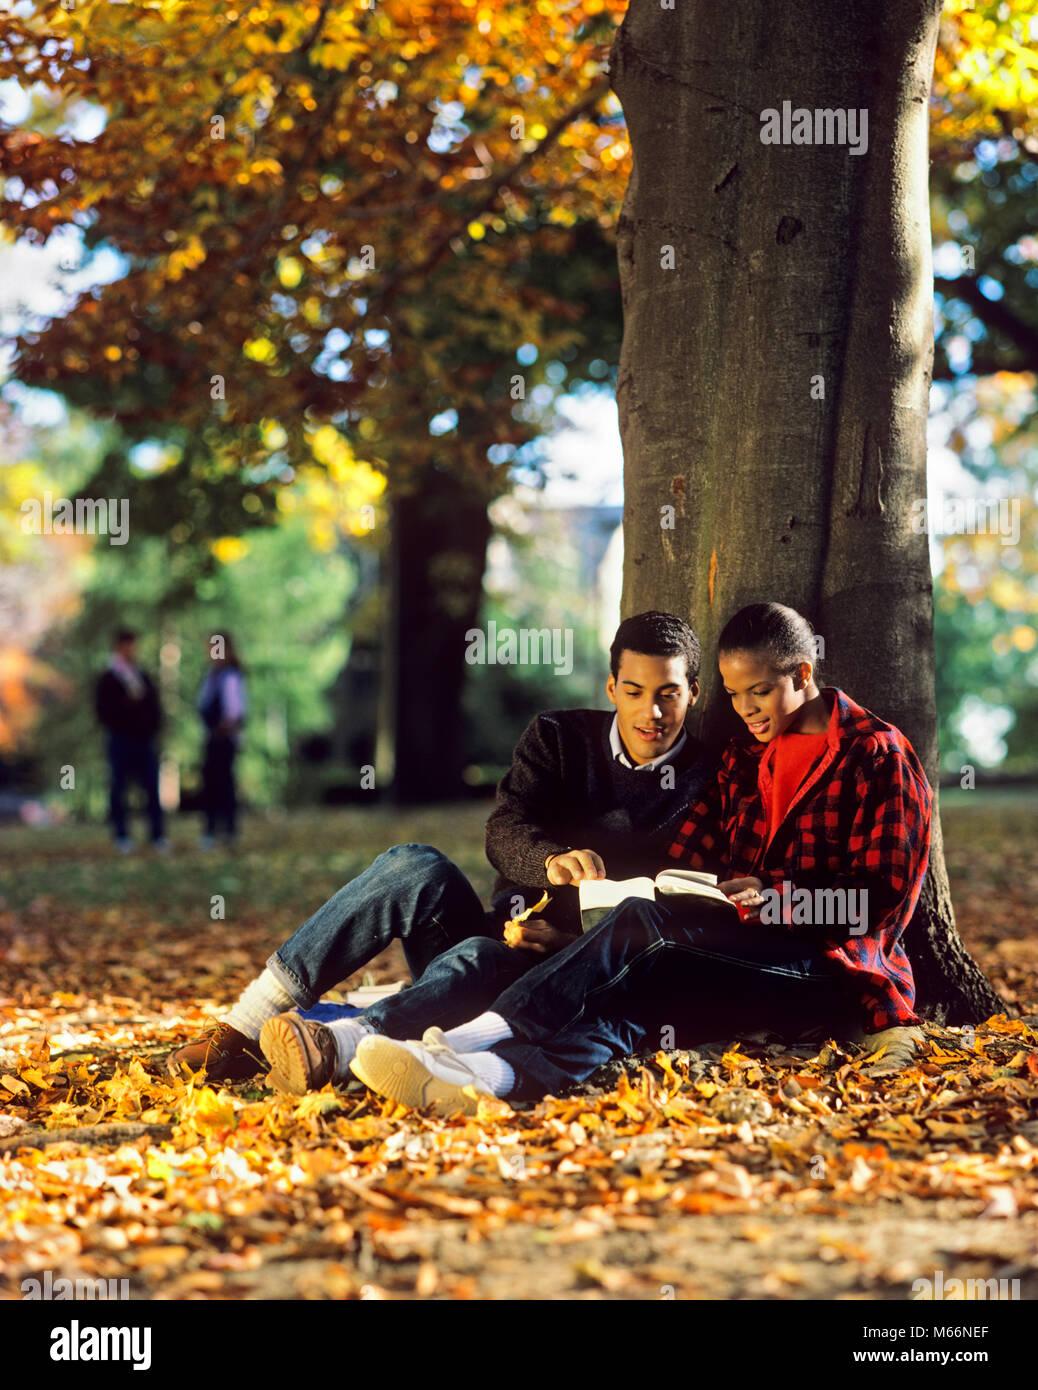 1980s AFRICAN AMERICAN COUPLE STUDYING UNDER TREE ON CAMPUS AUTUMN LEAVES - ks25792 DEG002 HARS STYLE COMMUNICATION - Stock Image